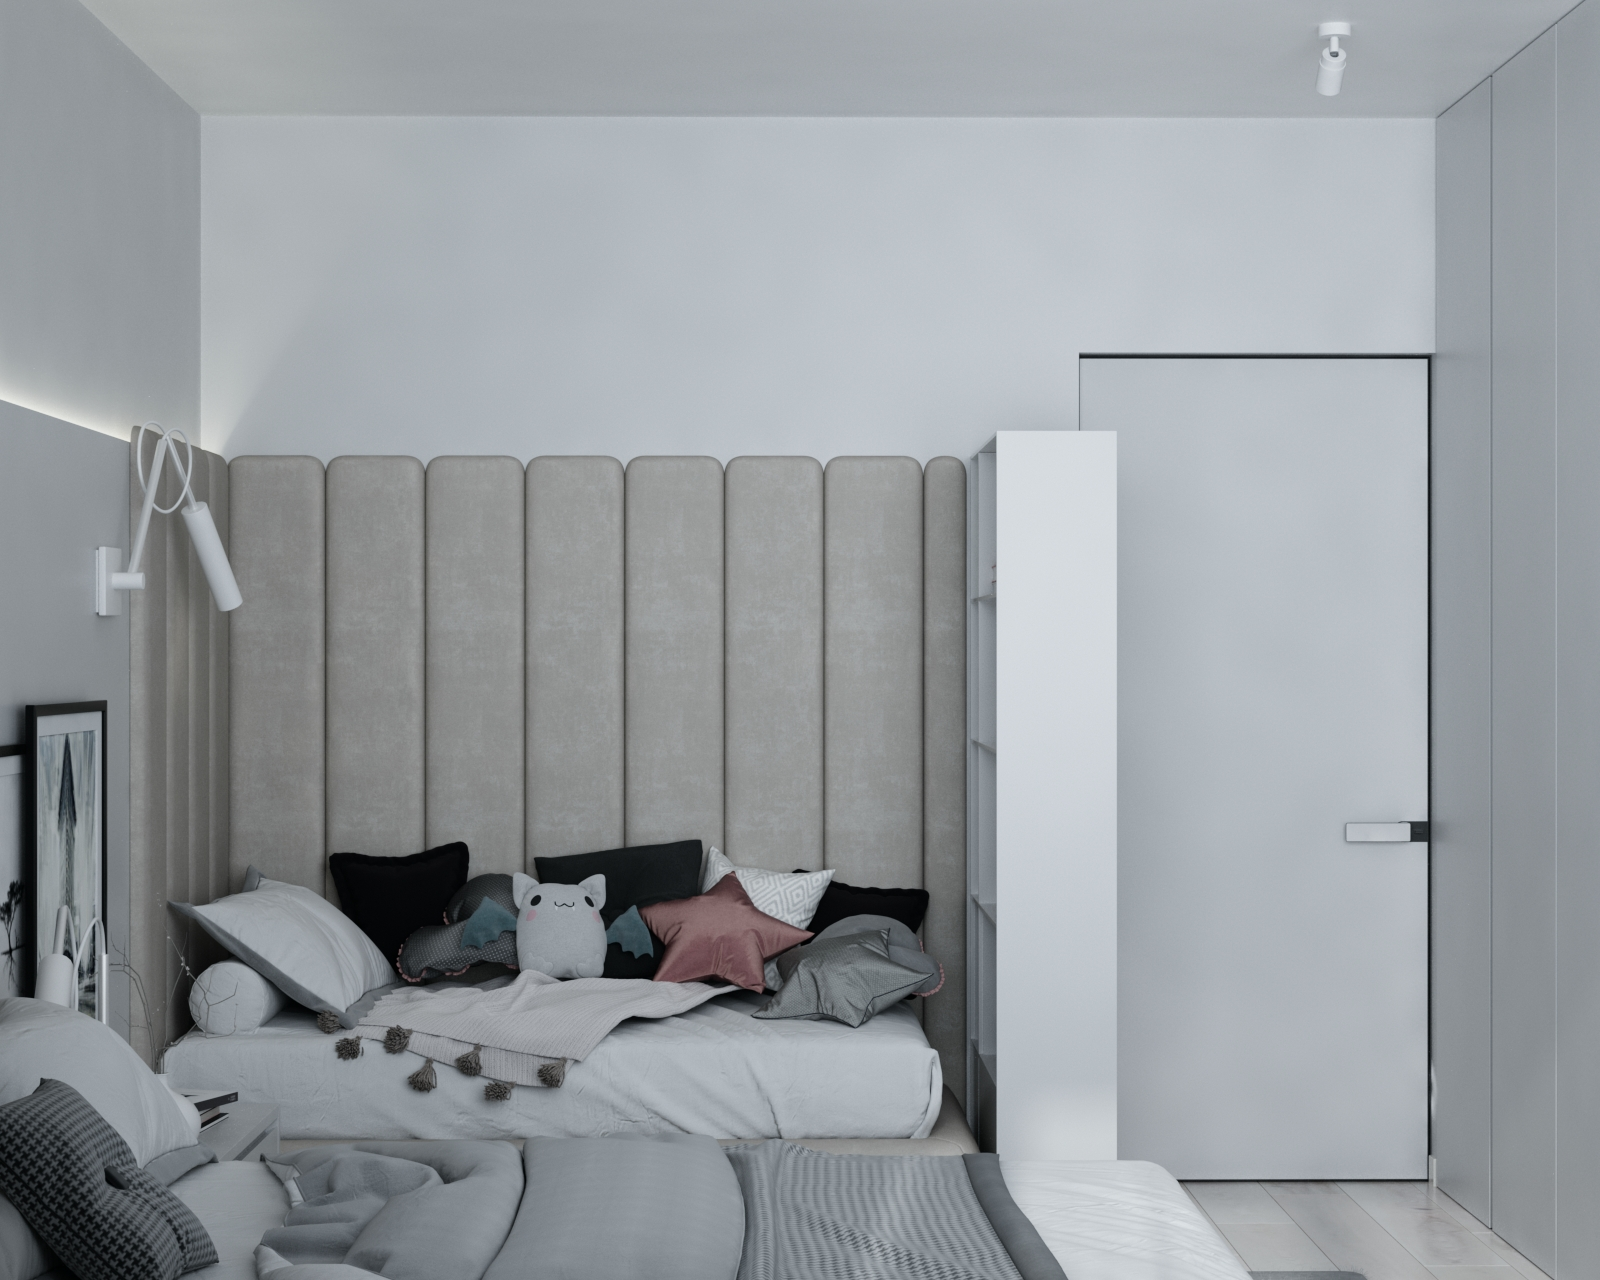 Картинка мягких панелей для кровати